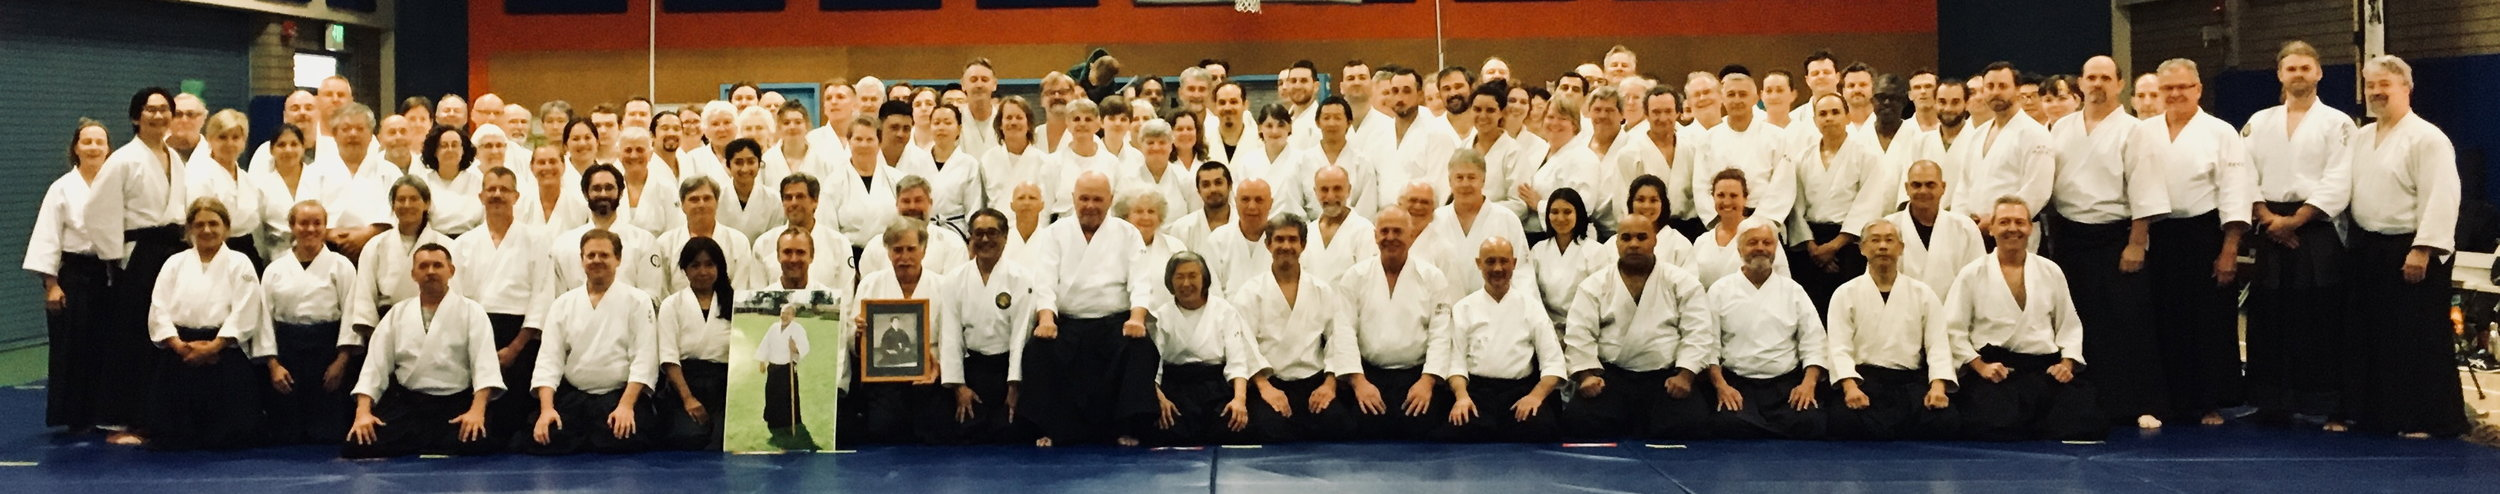 2018 Group Photo.jpg